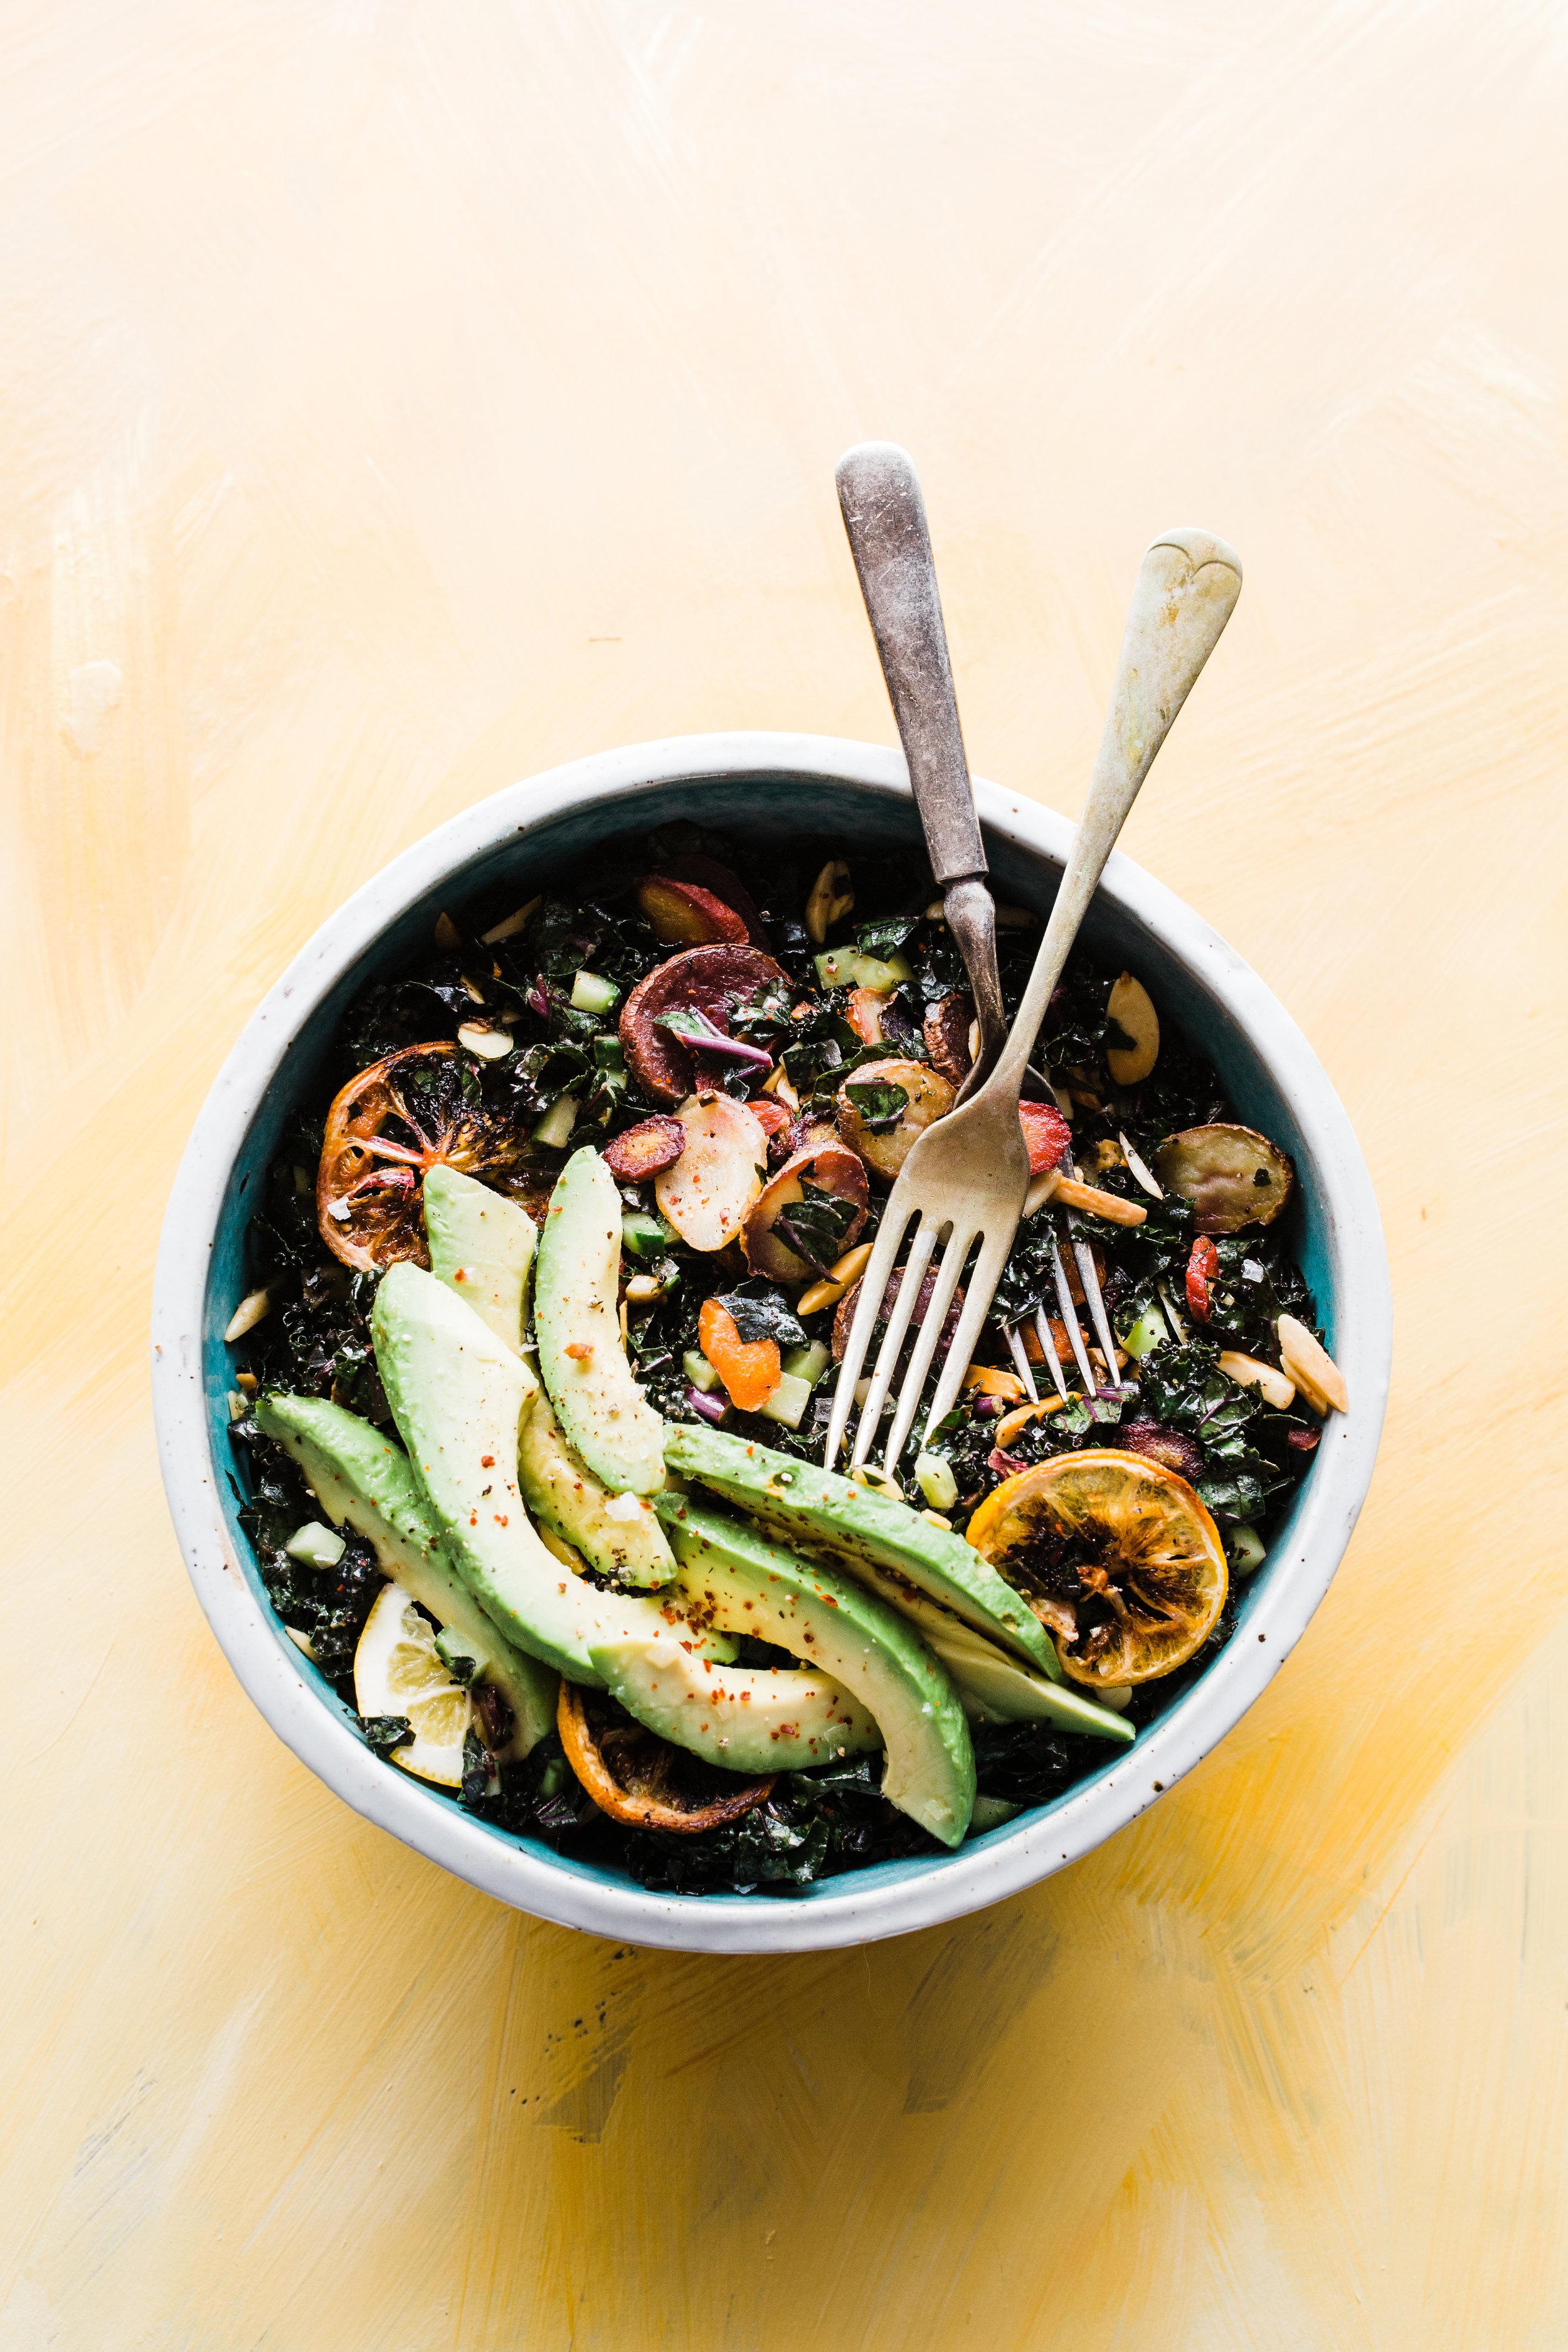 Kale & Carrots Detox Bowl (Vegan, Low-Carb)